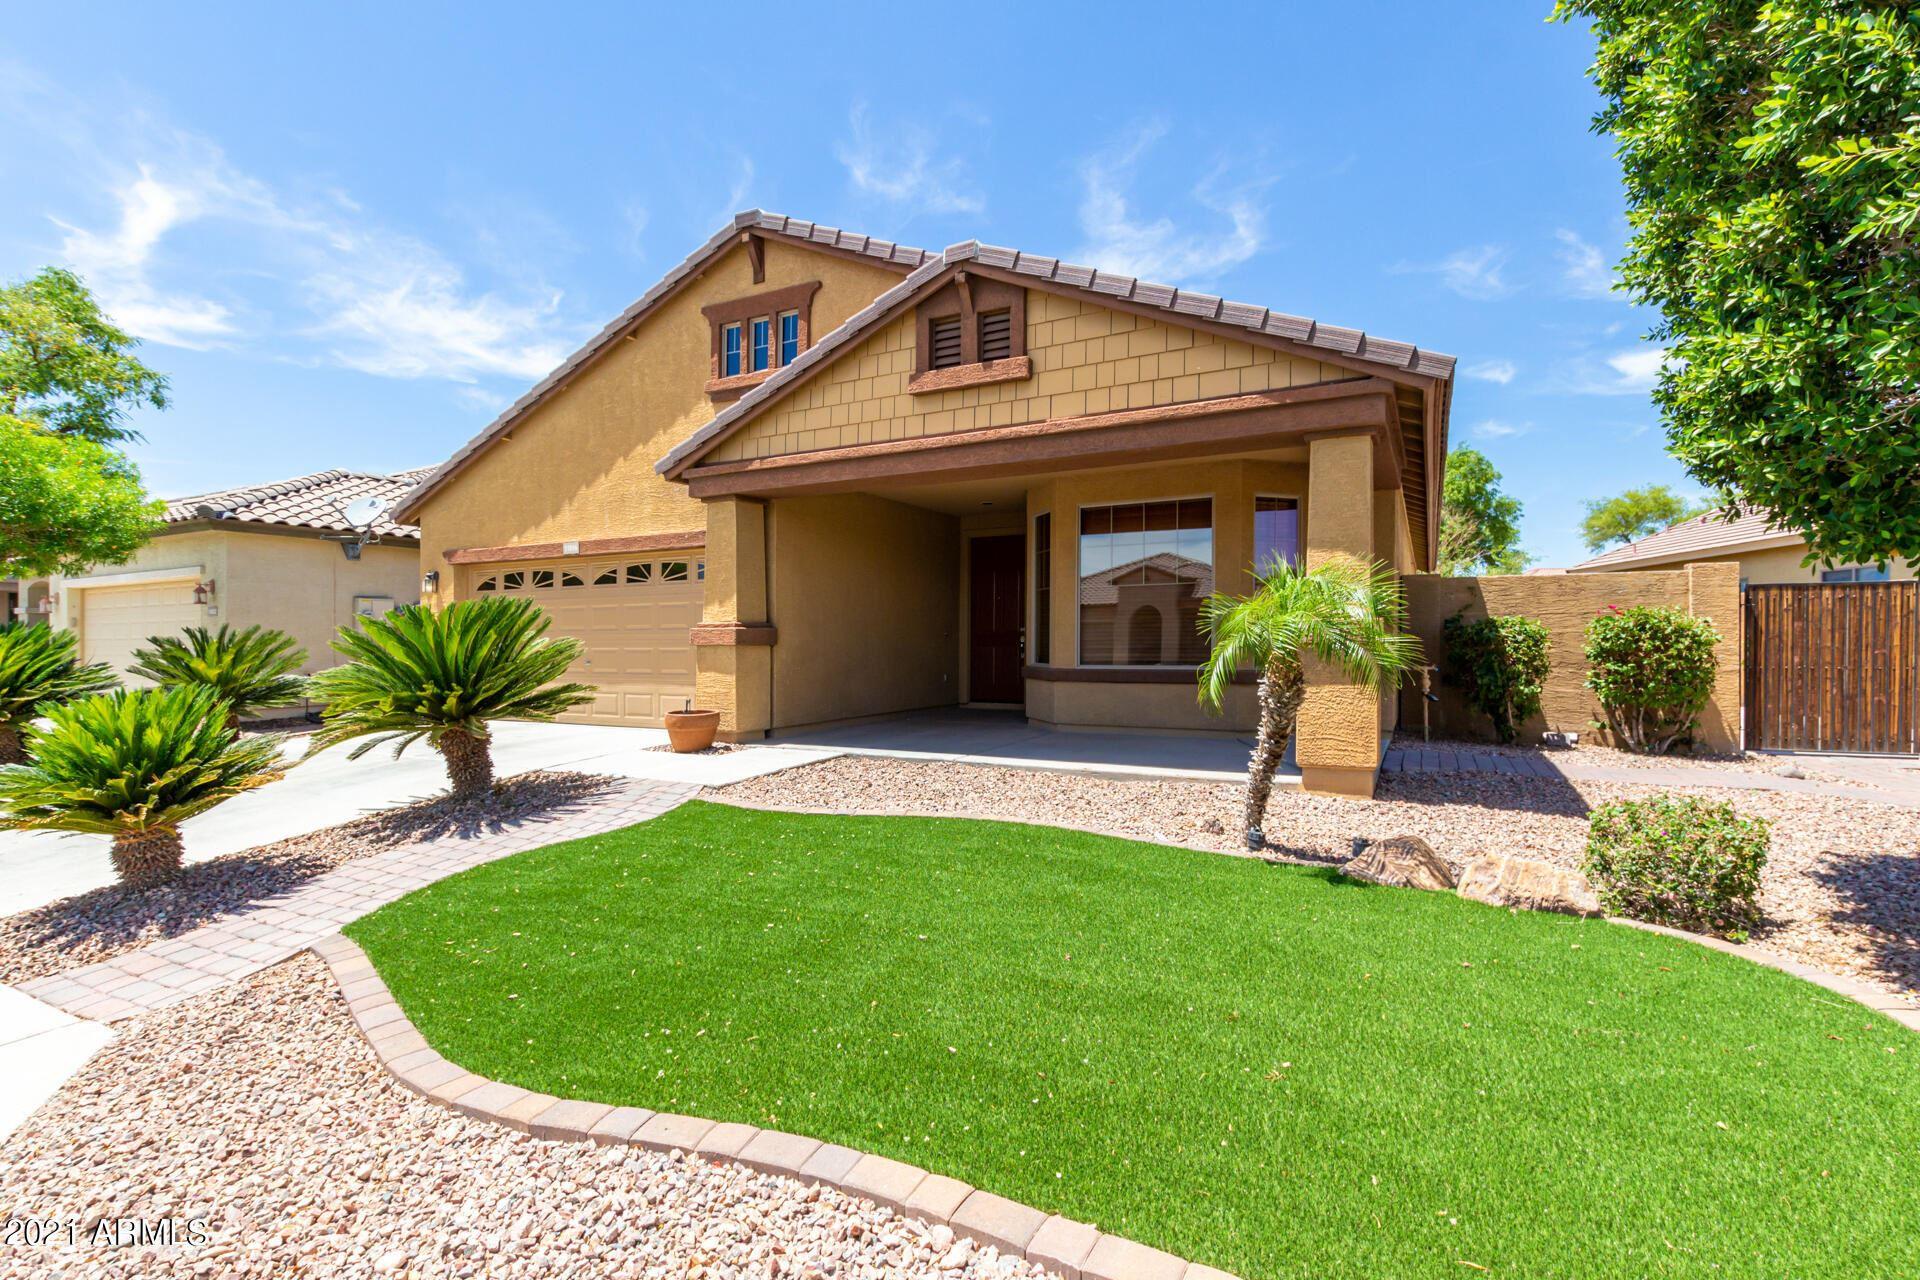 Photo of 11816 W VILLA CHULA Lane, Sun City, AZ 85373 (MLS # 6249416)